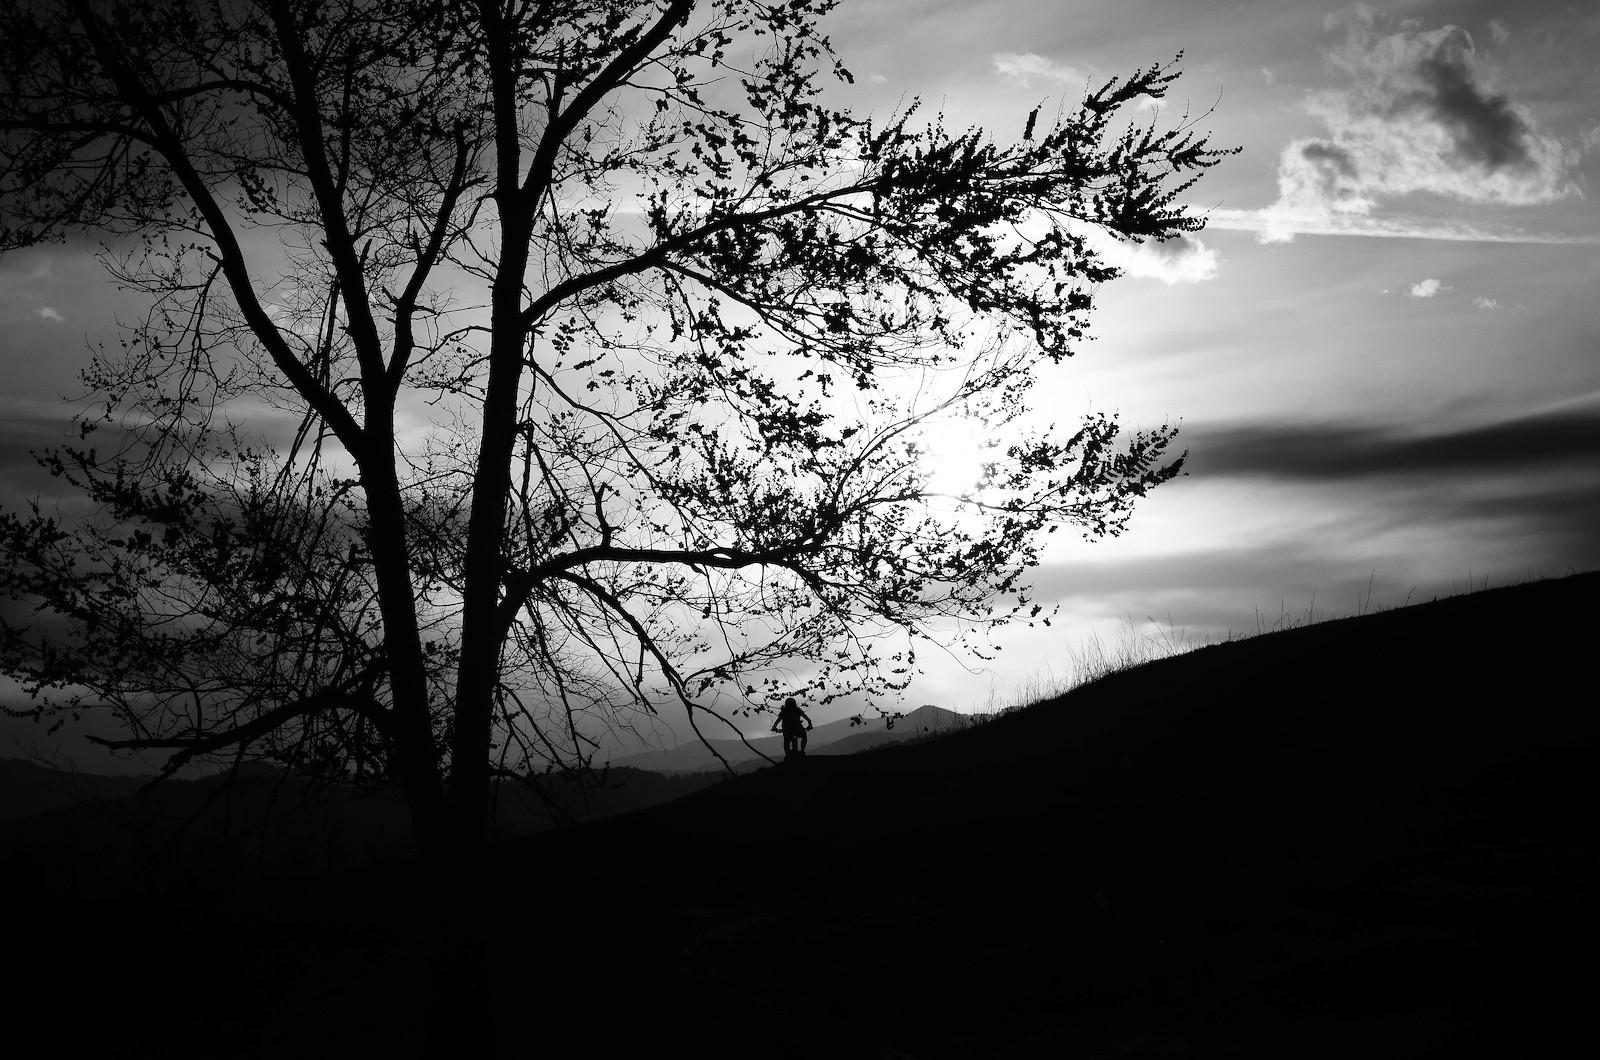 Into the Sunset - rhiannon - Mountain Biking Pictures - Vital MTB